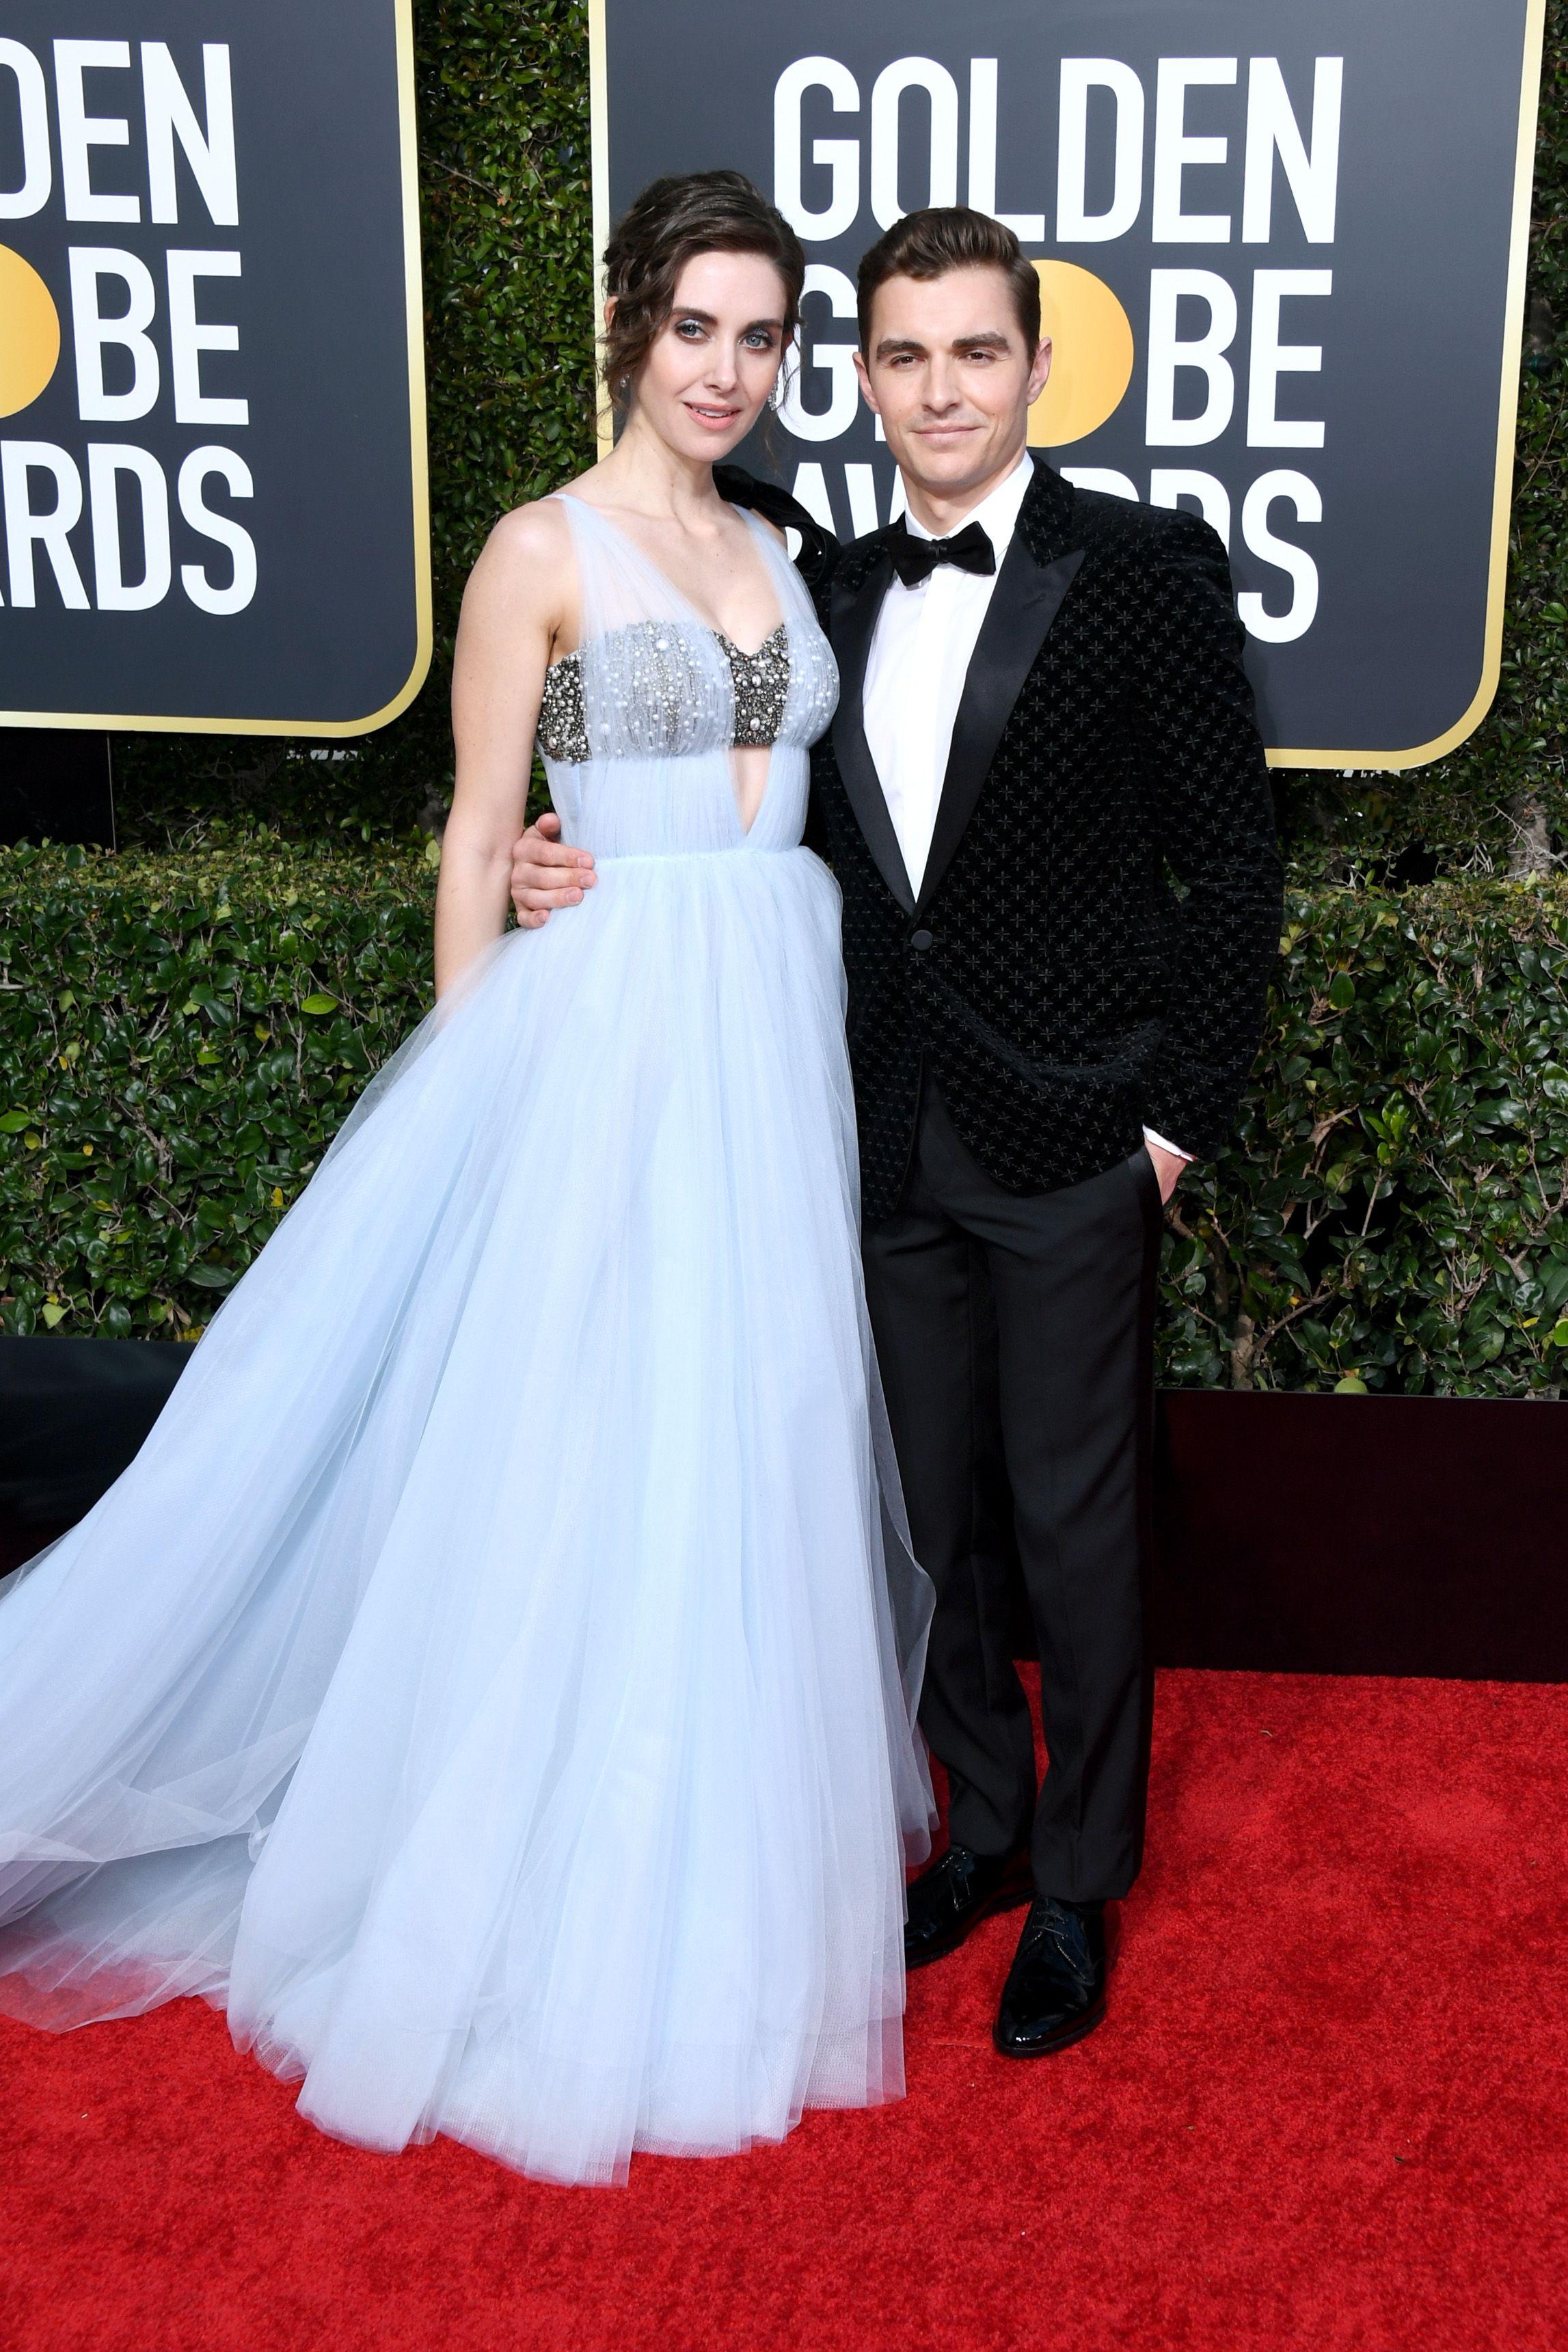 golden globes 2019 couples